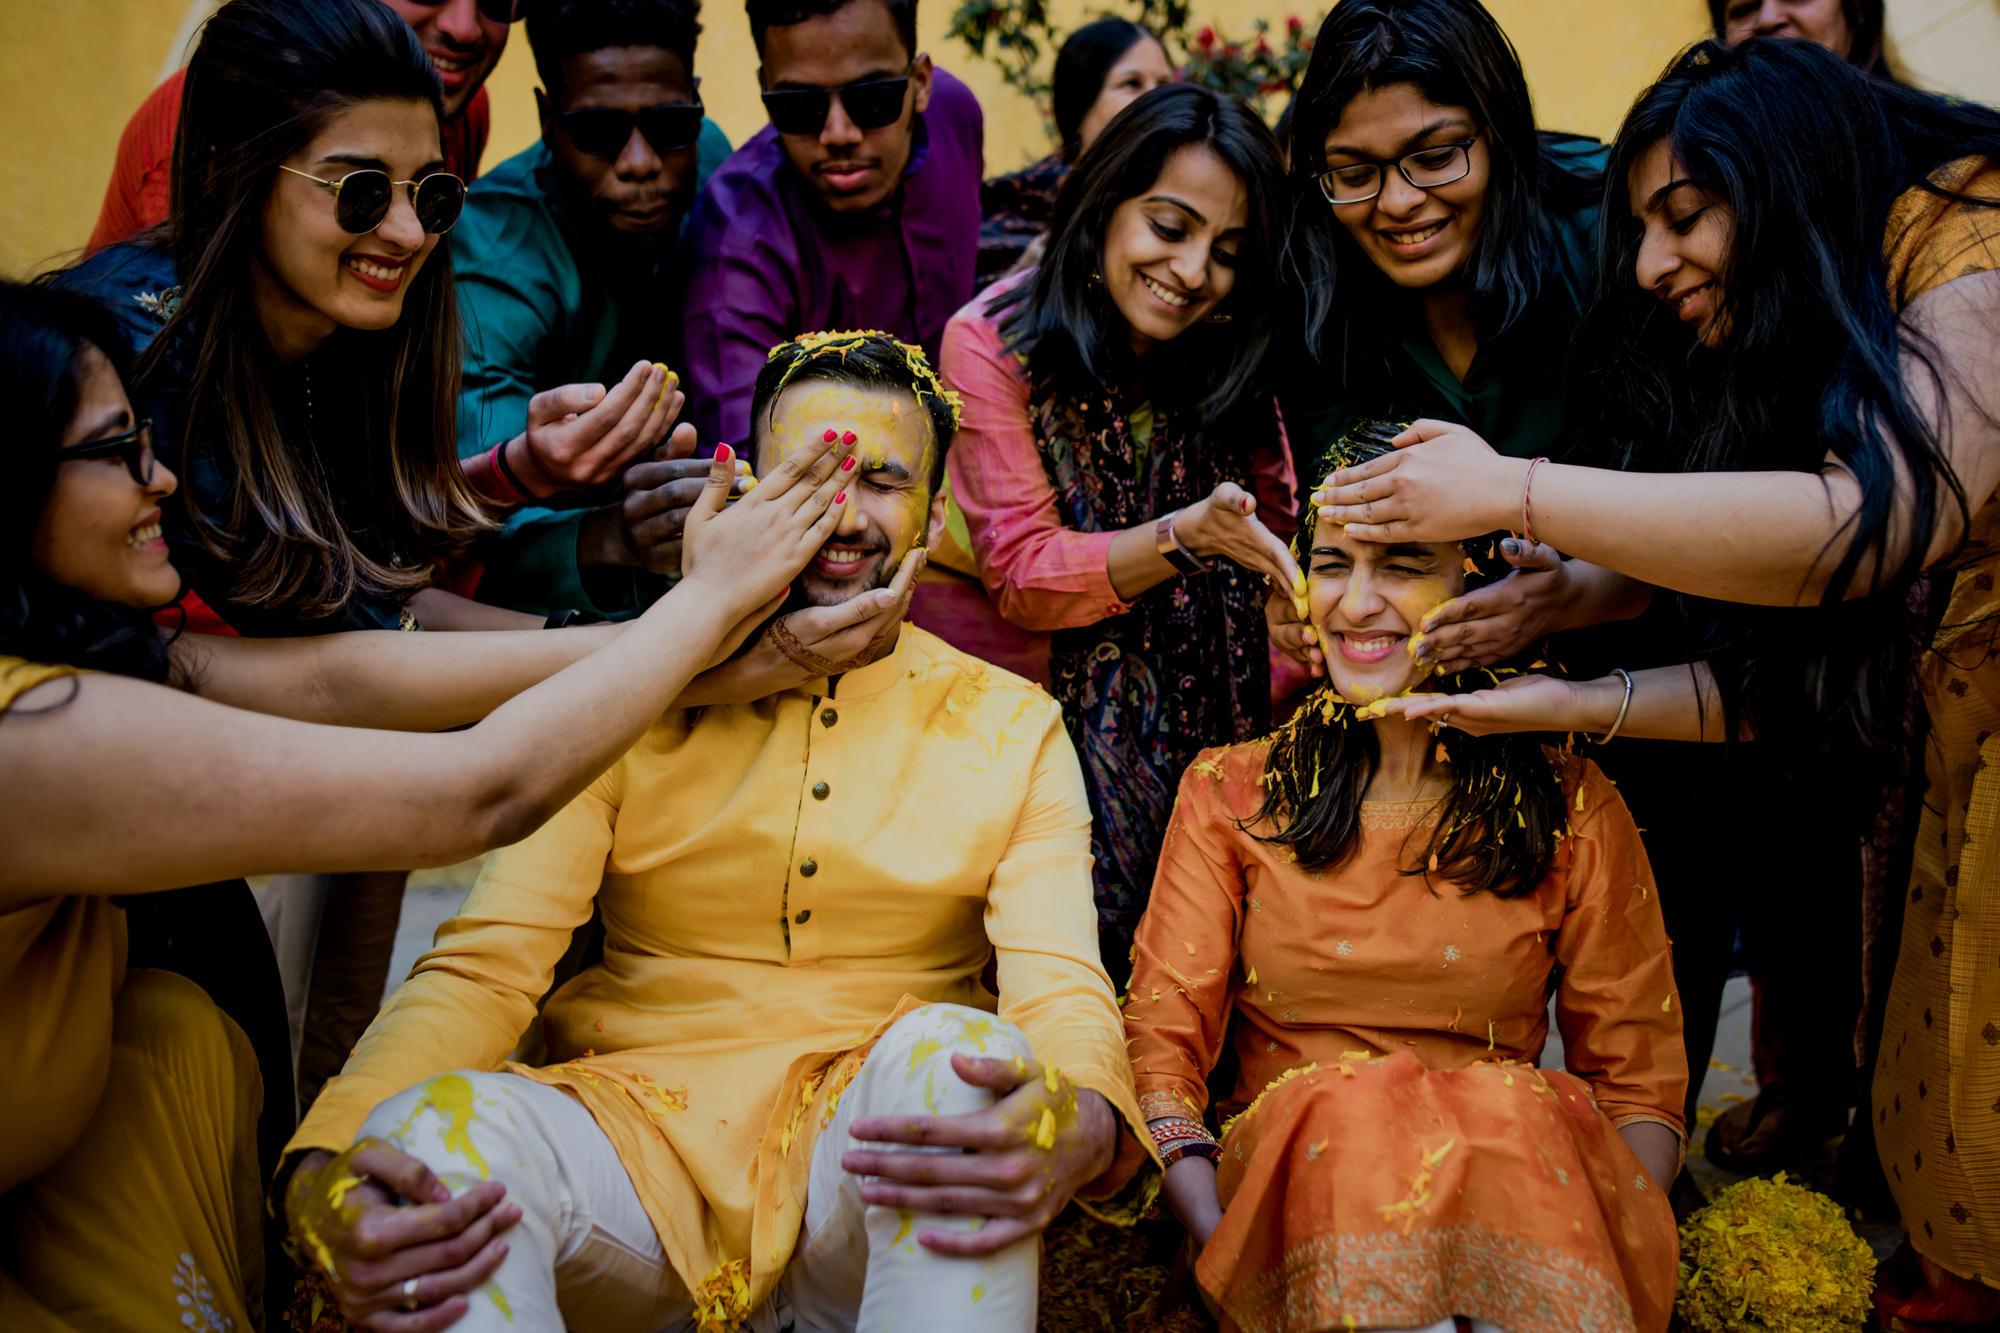 Happy saffron ritual - photo by Rimi Sen Photographers